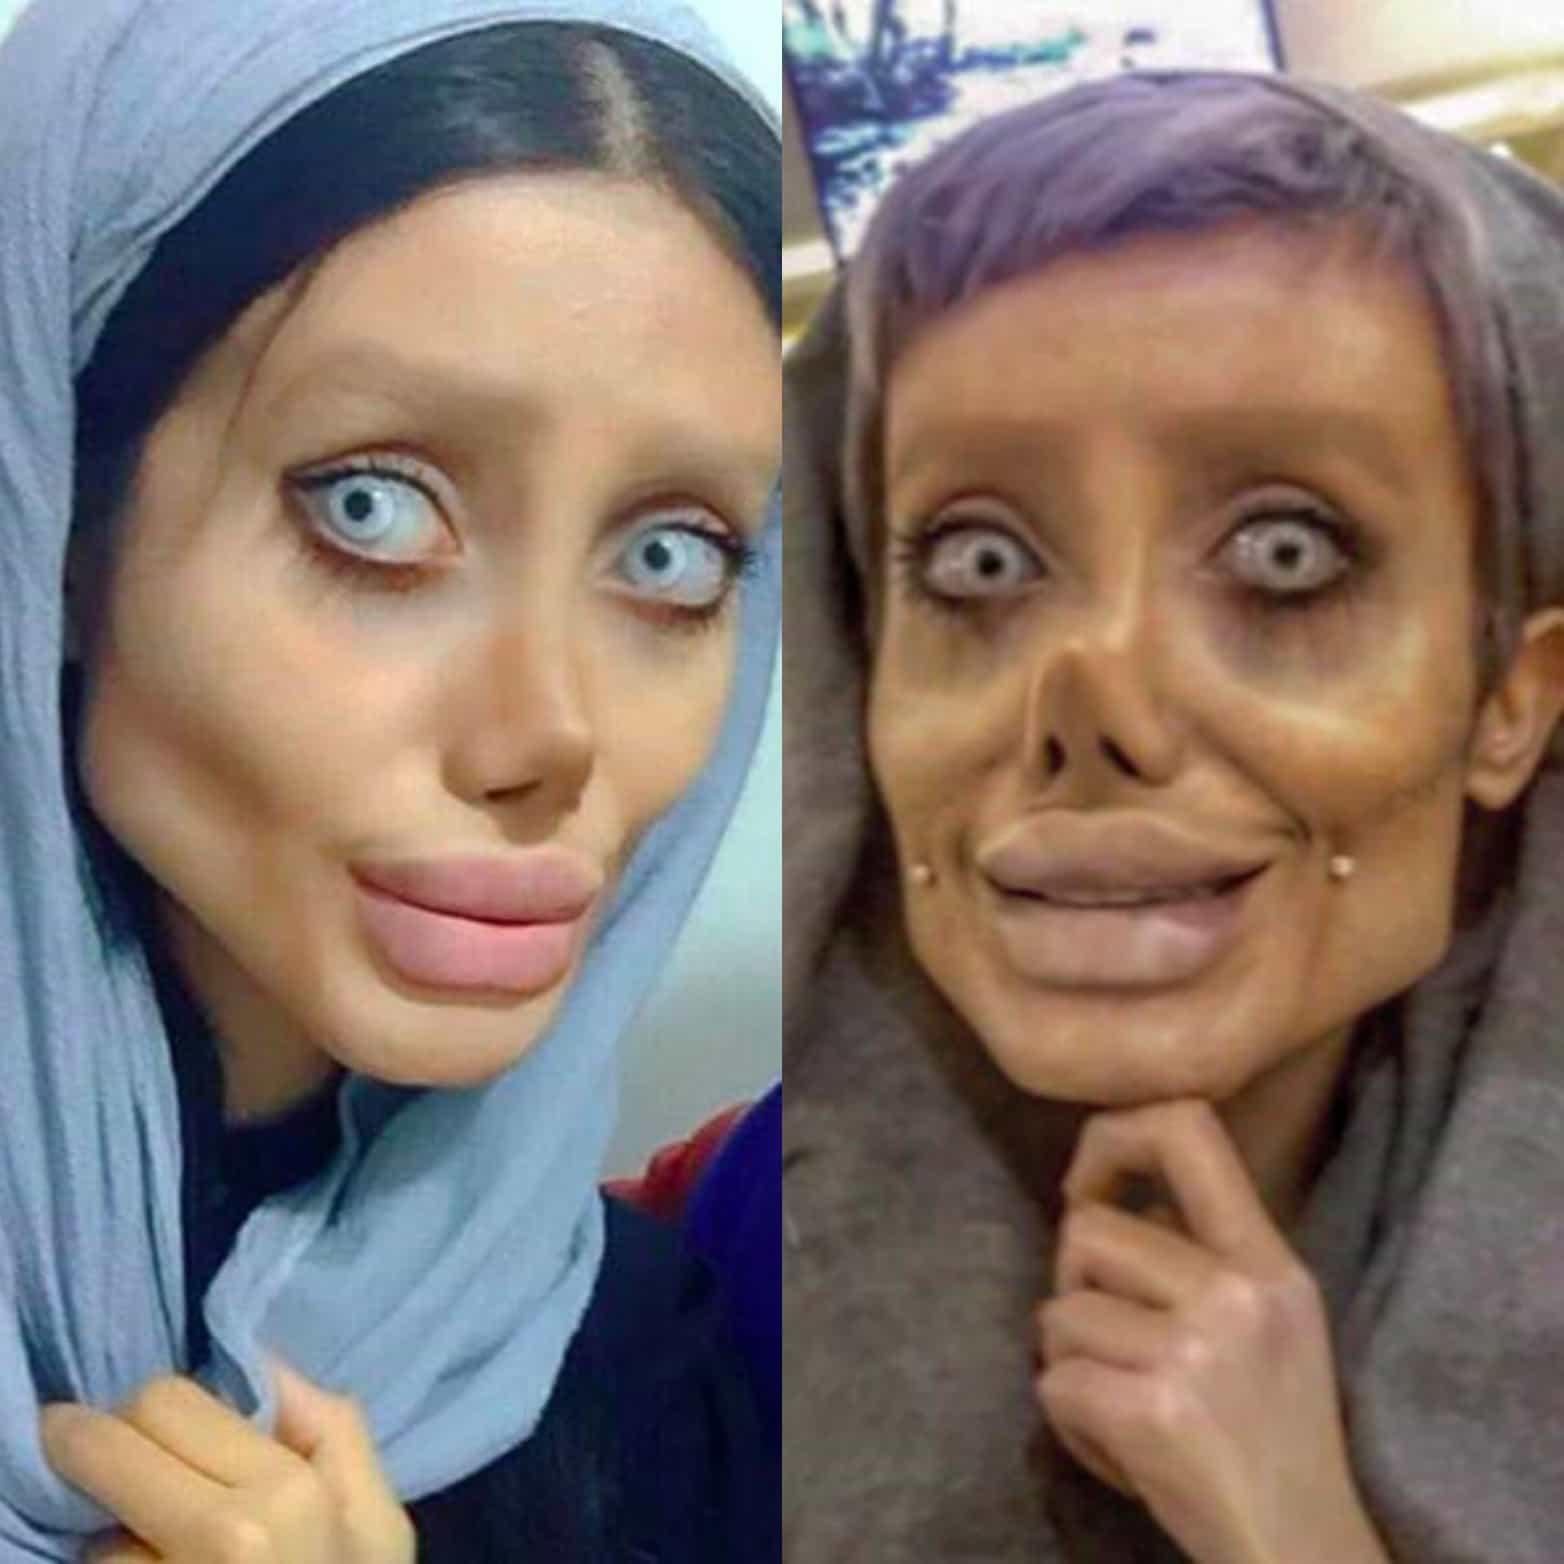 Sahar Tabar Makeup >> Elle a subi 40 opérations pour ressembler à Angelina Jolie | Loop News